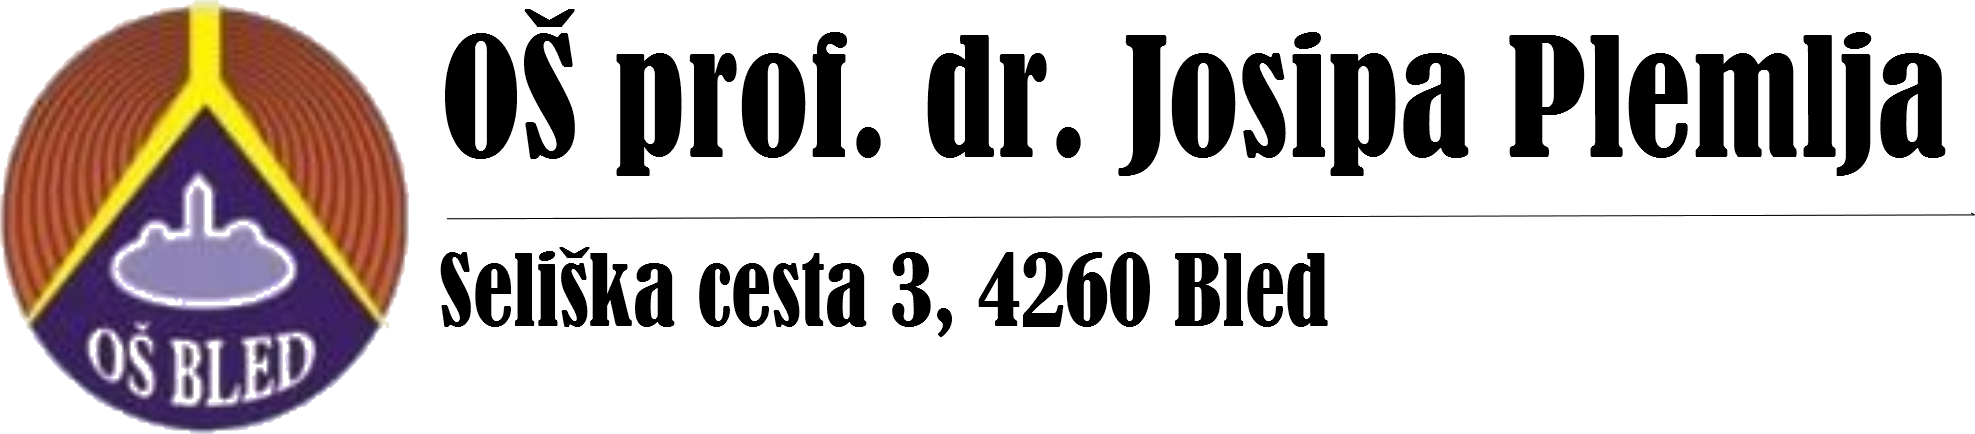 OŠ prof. dr. Josipa Plemlja Bled